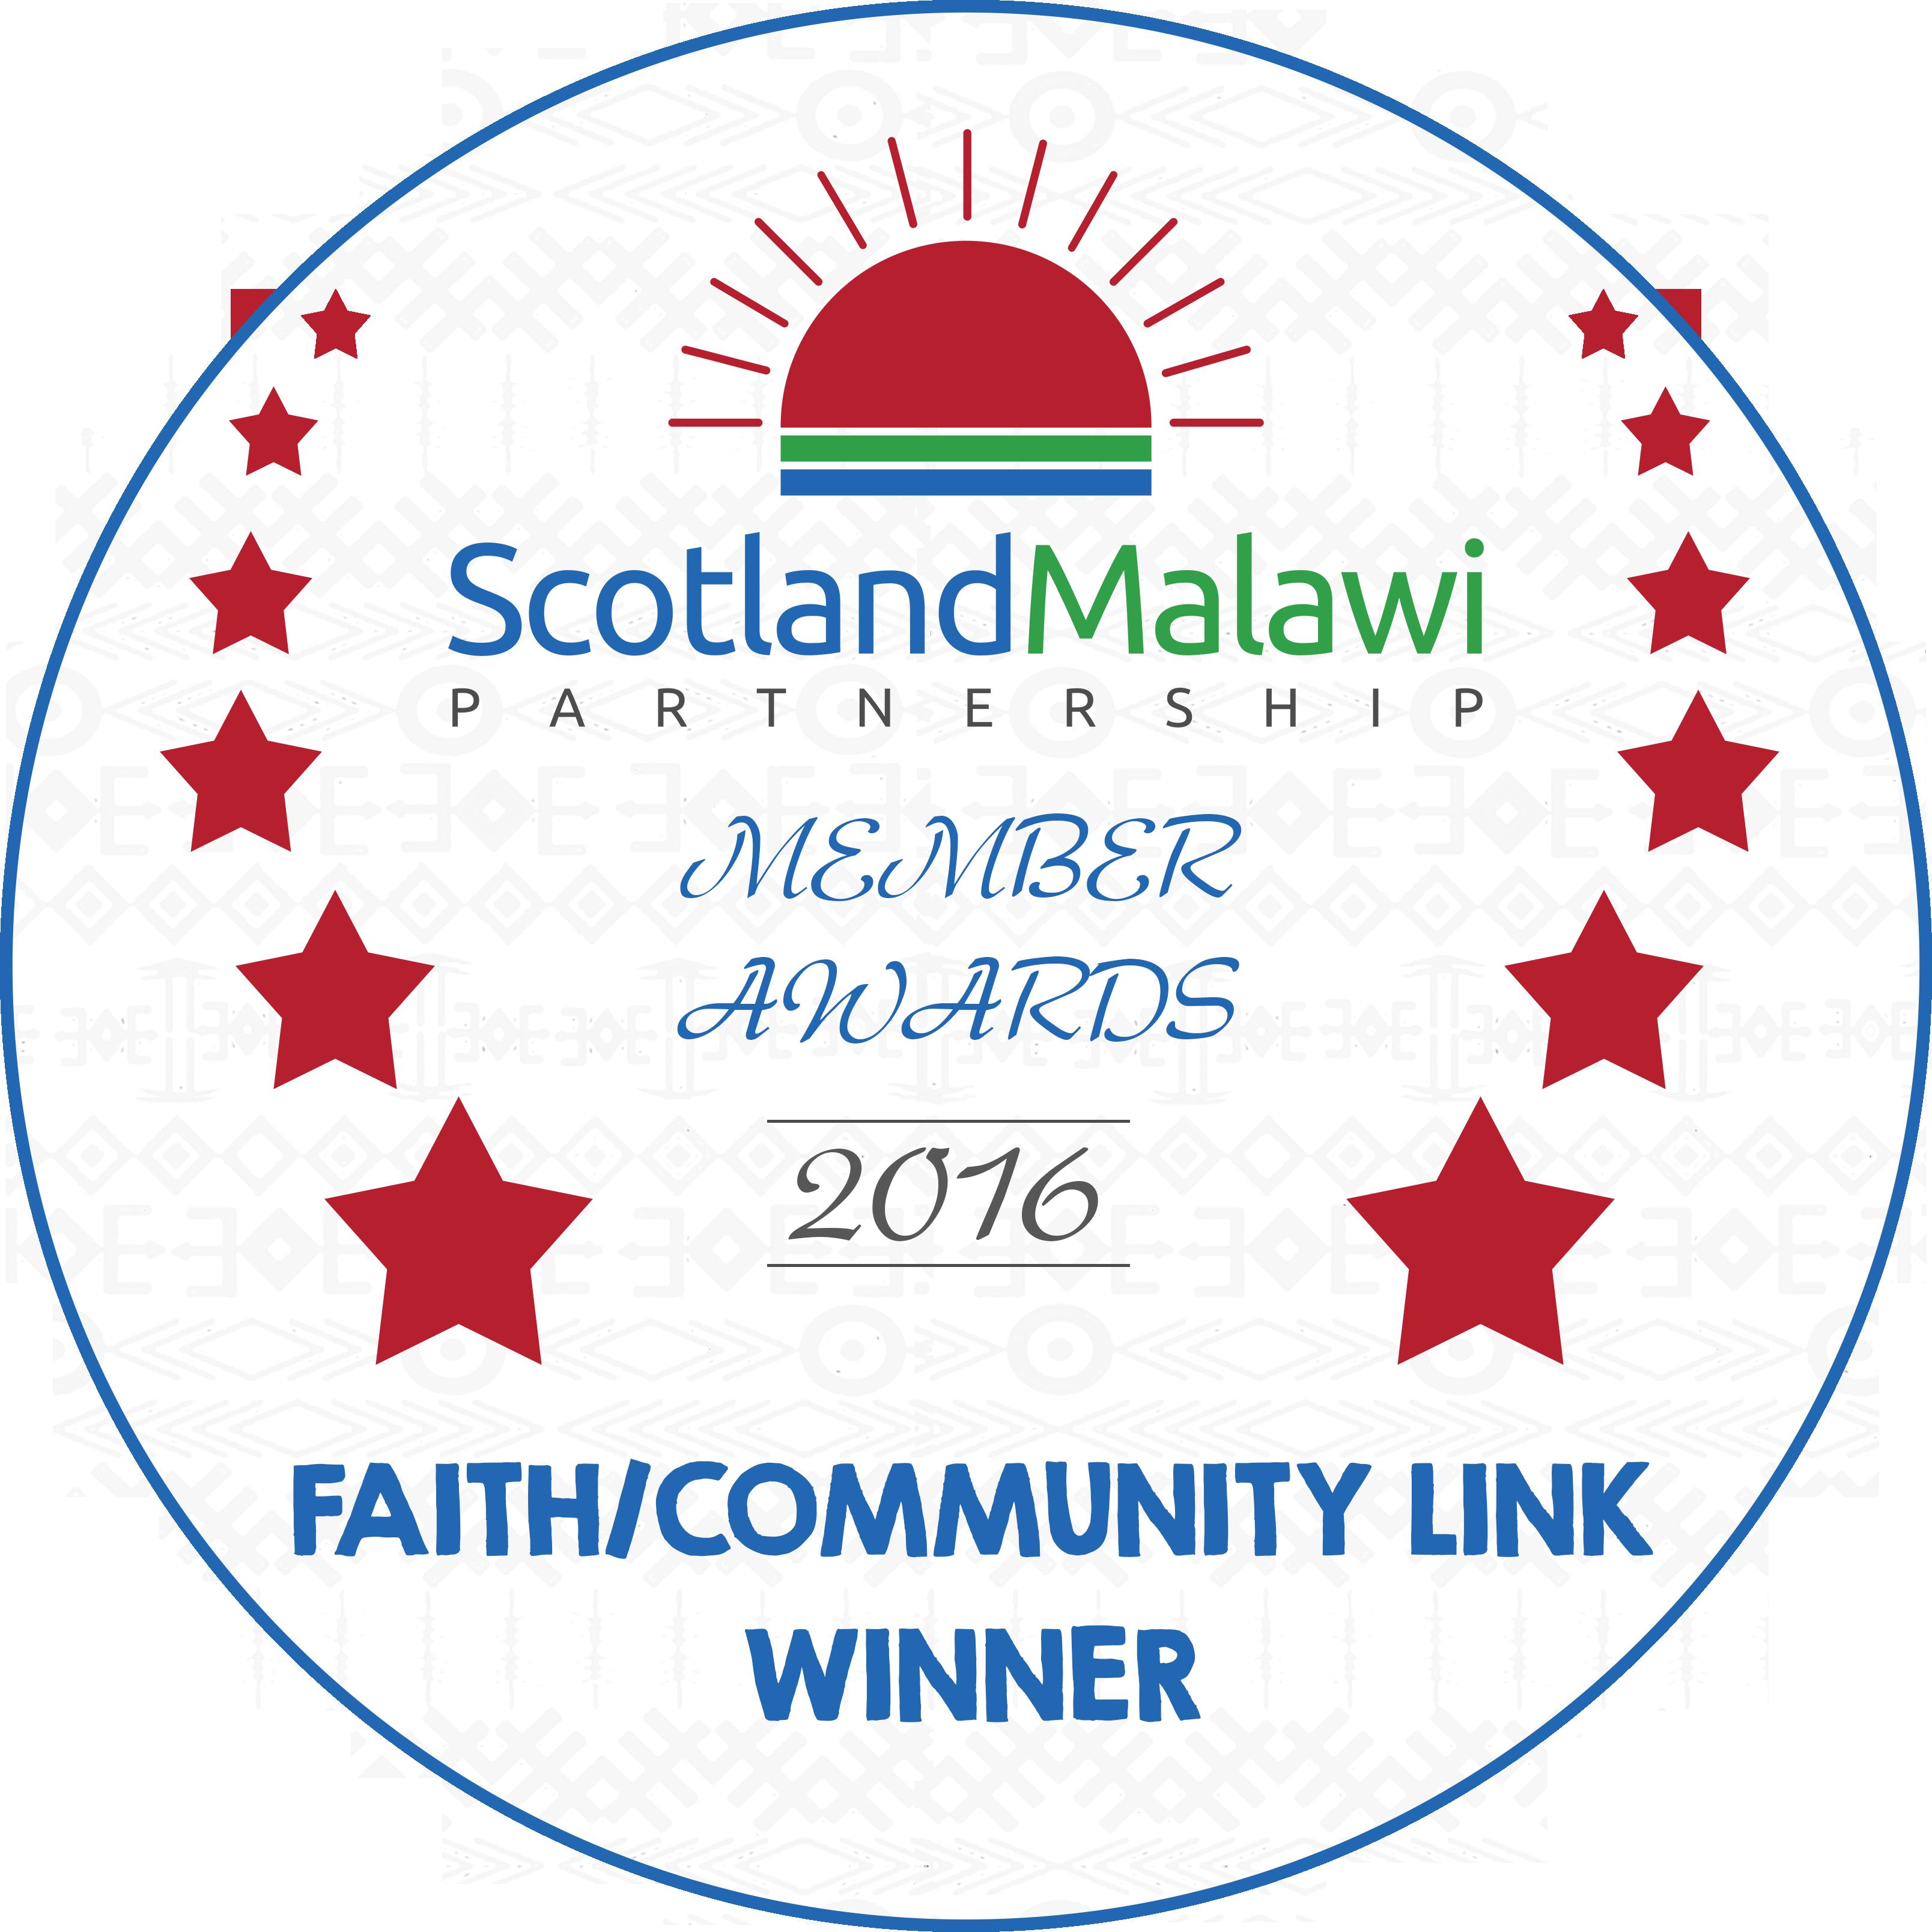 faith-community-link-winner